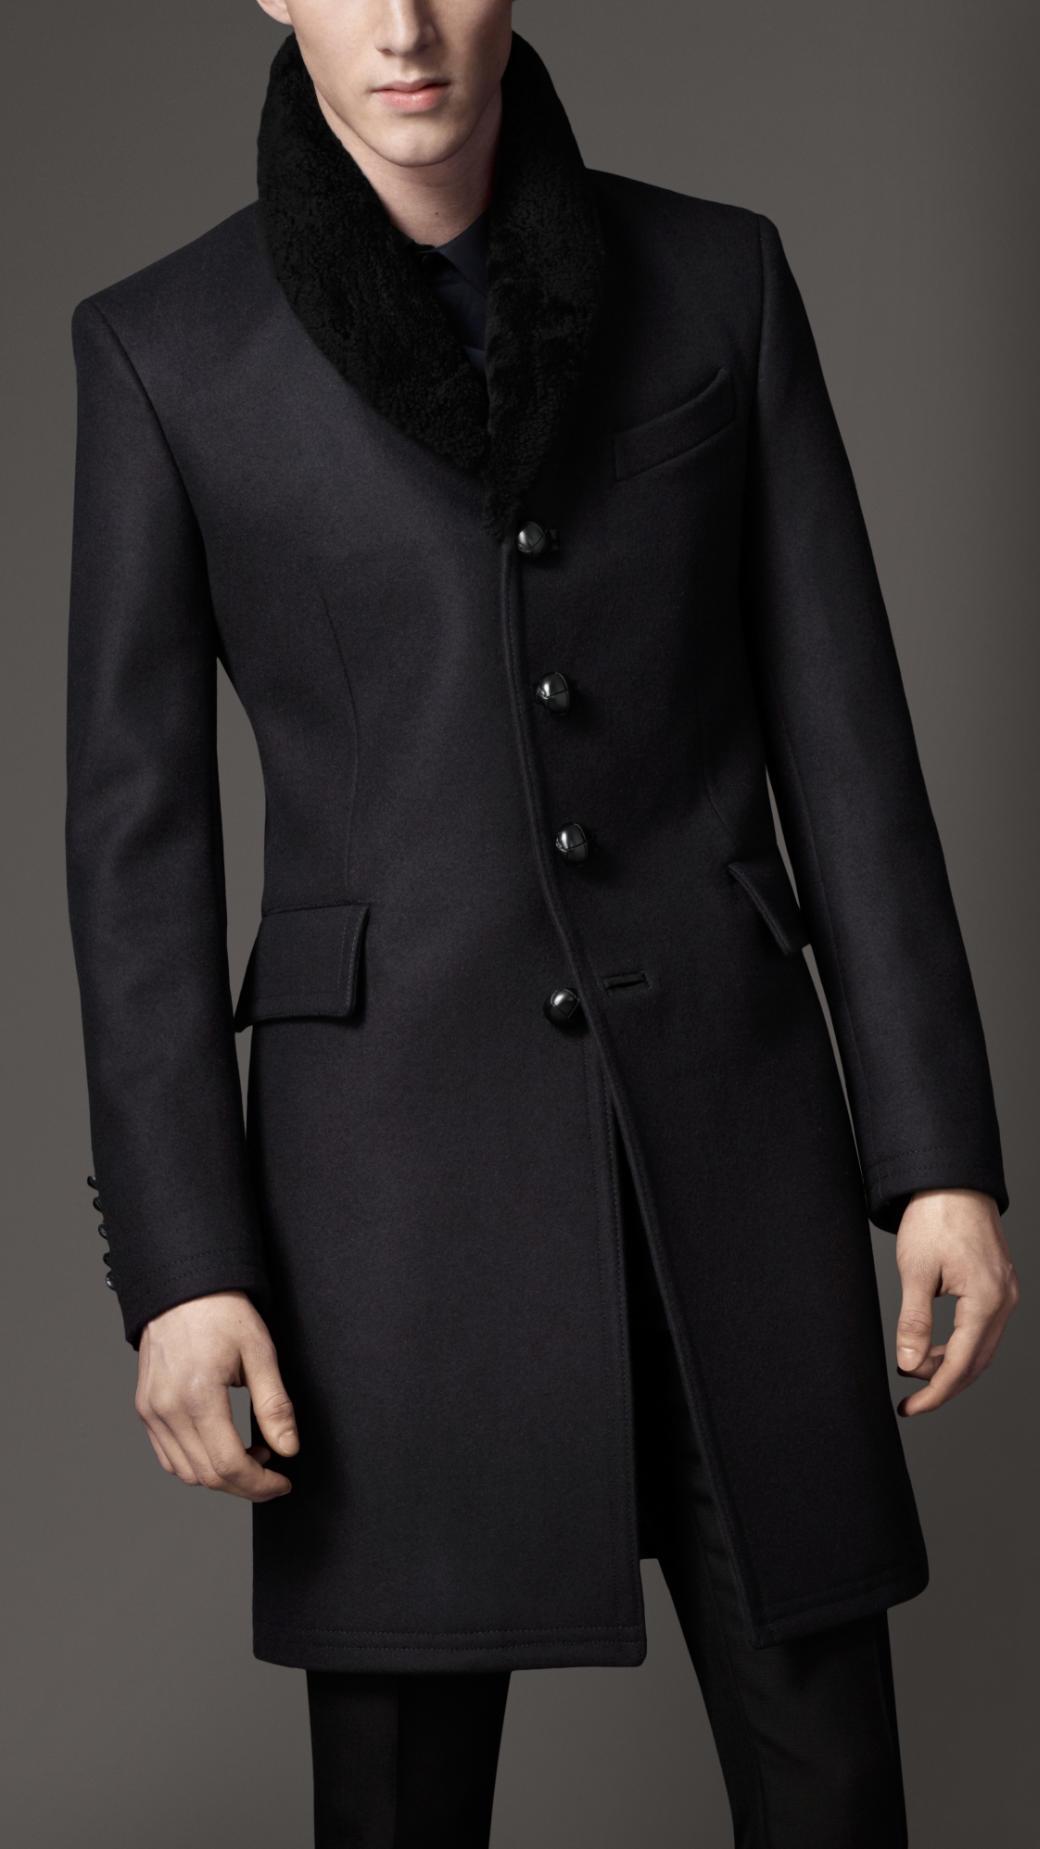 Burberry Shearling Collar Top Coat In Black For Men Navy